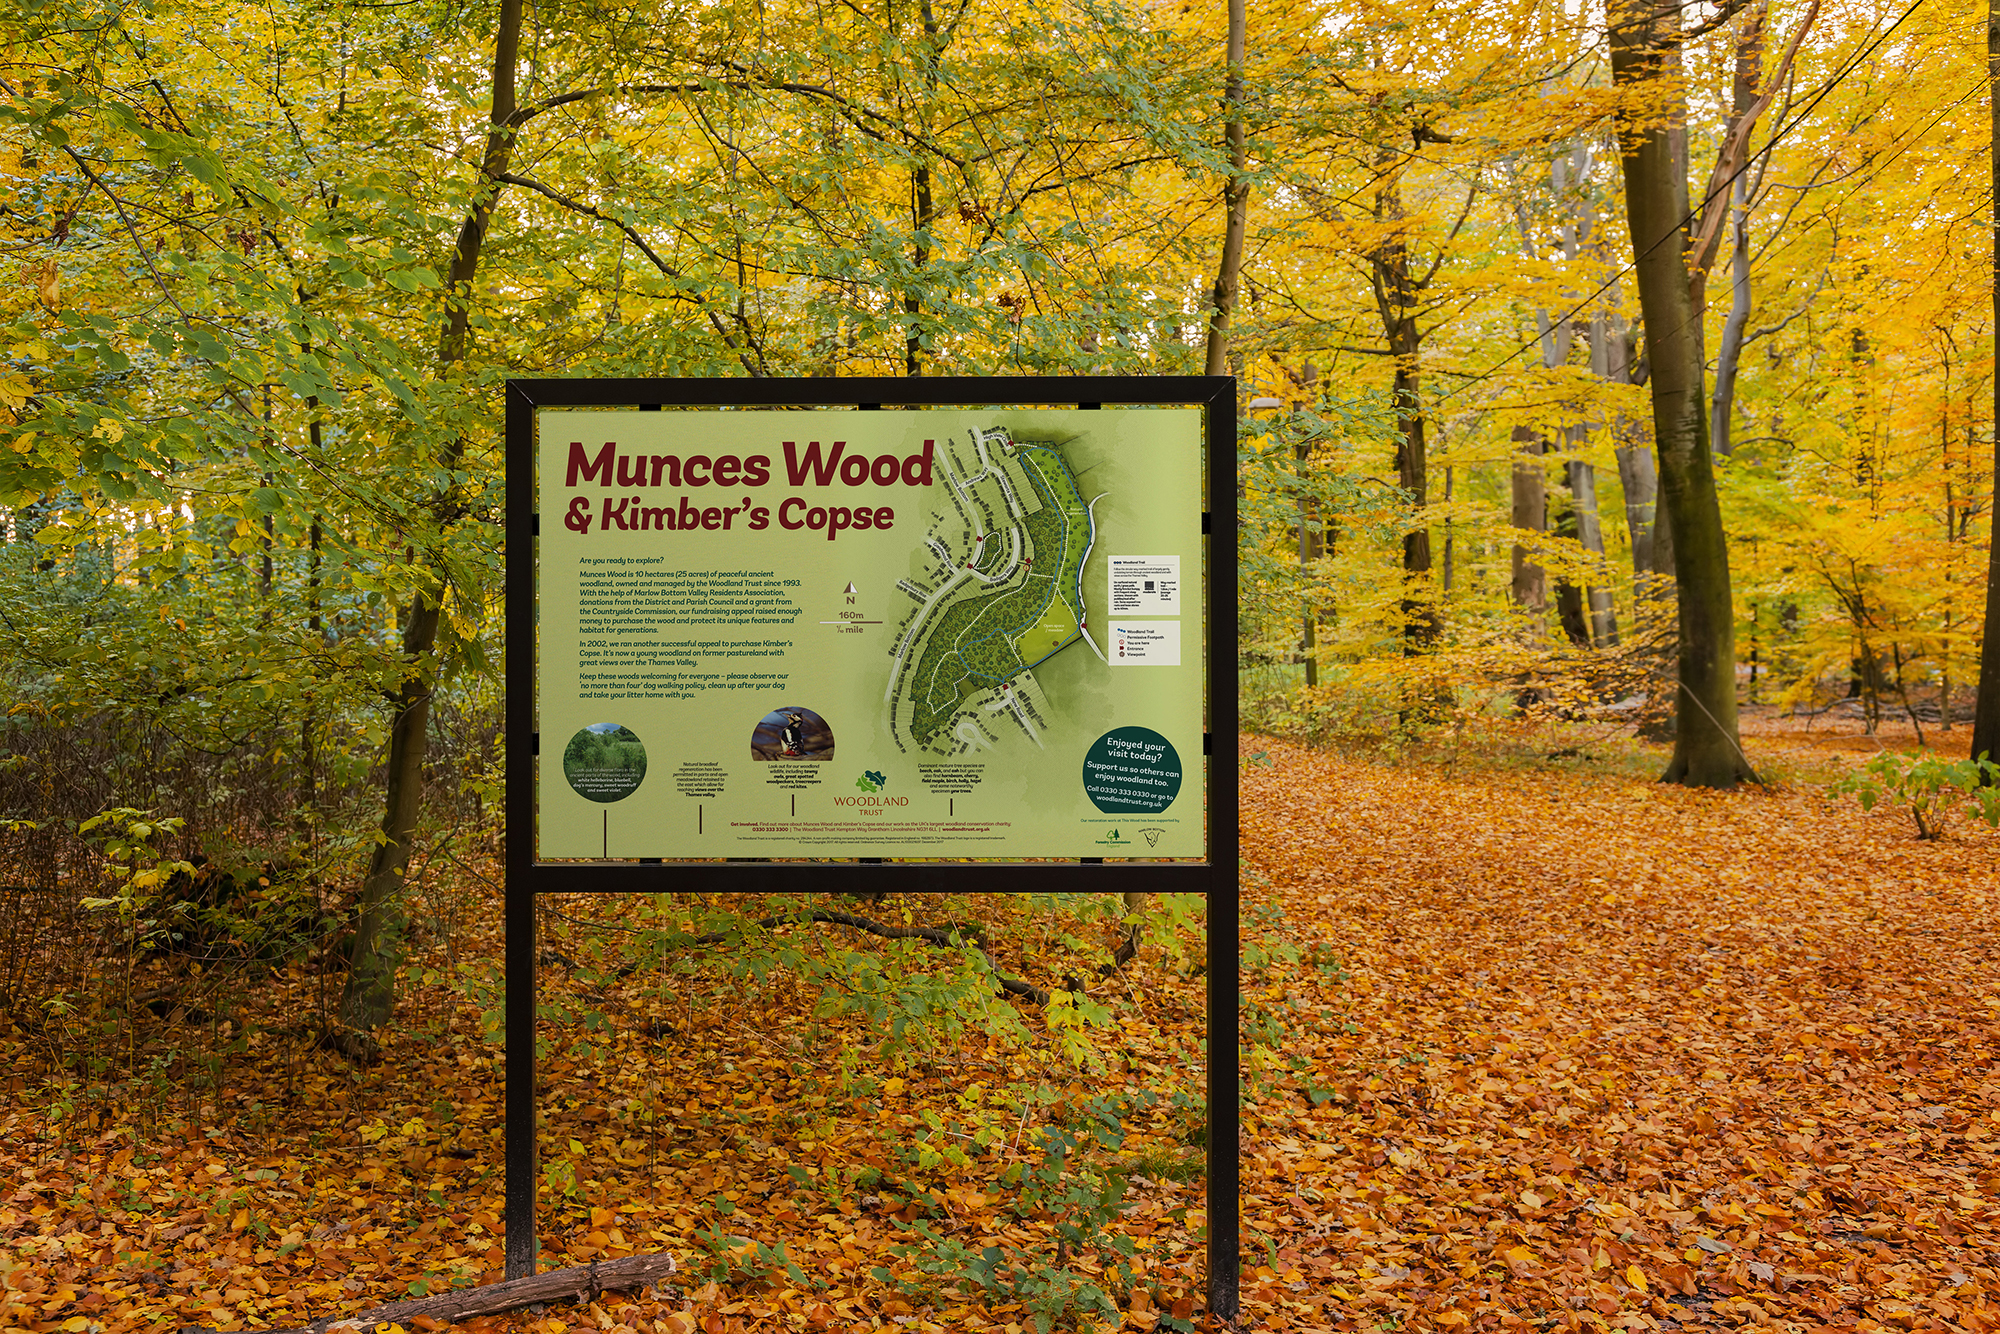 munces_wood_board.jpg